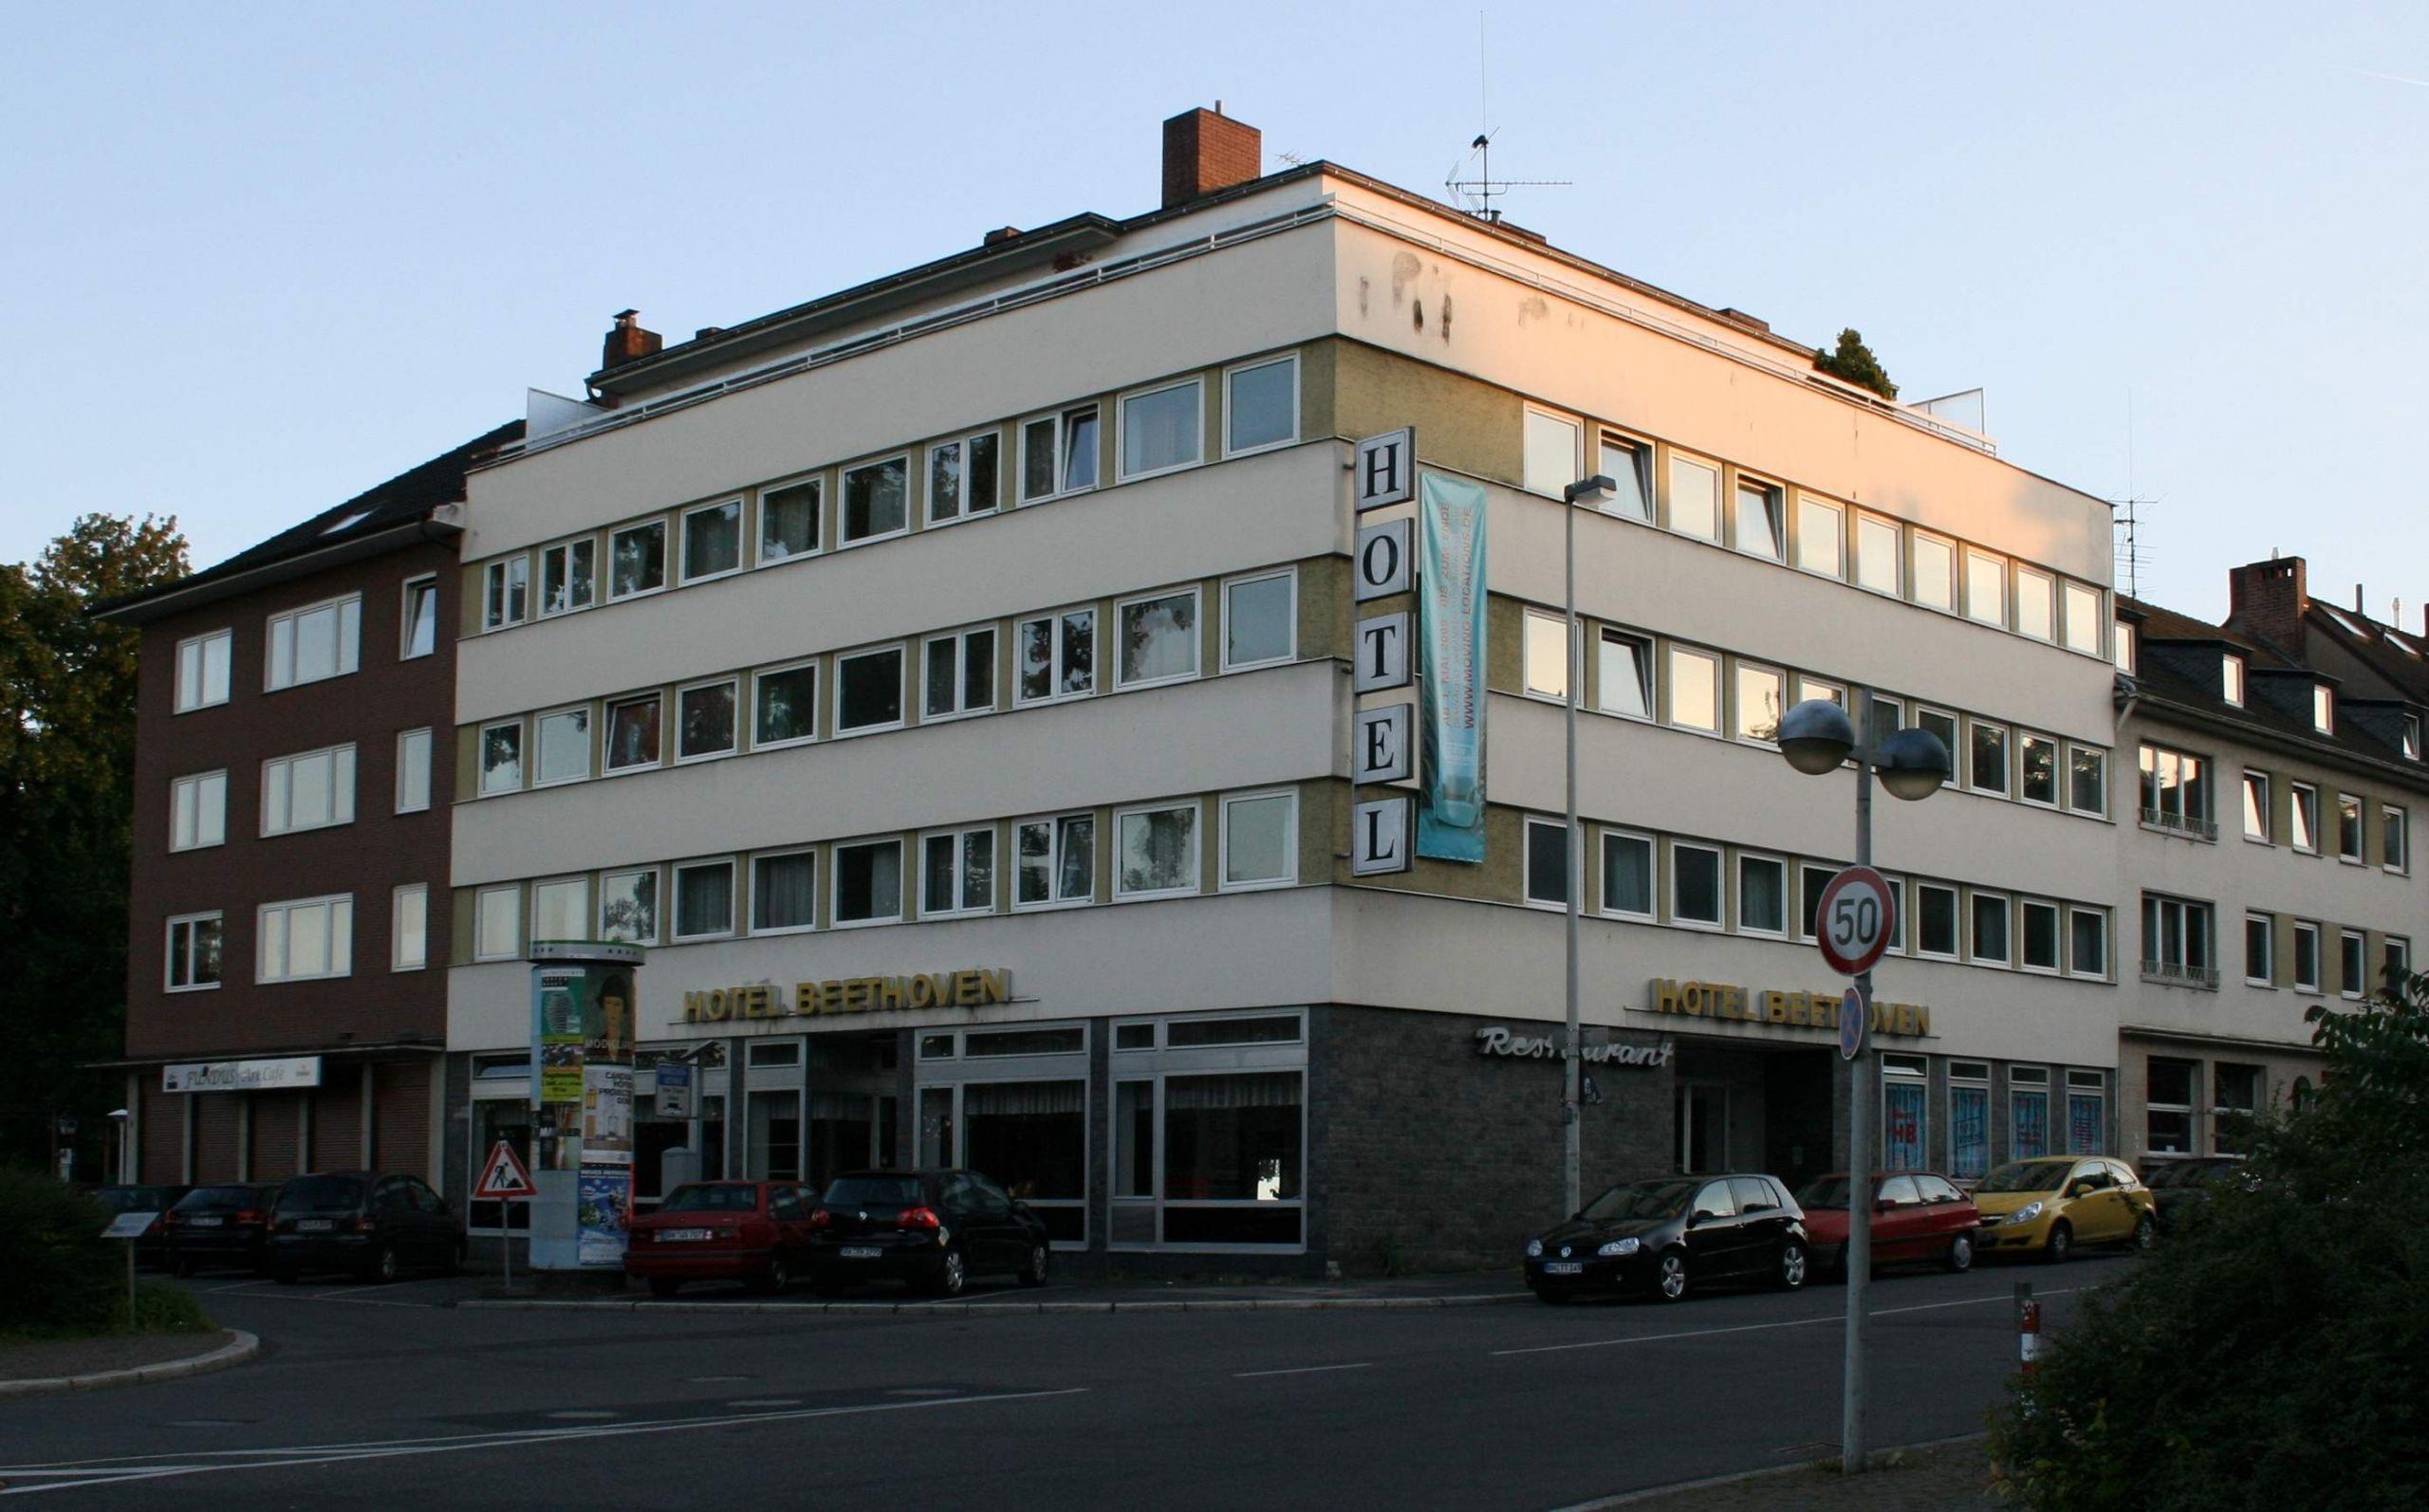 Hotel Garten Bonn Einzigartig Datei 2009 06 01 Bonn Rheingasse 26 Ehem Hotel Beethoven